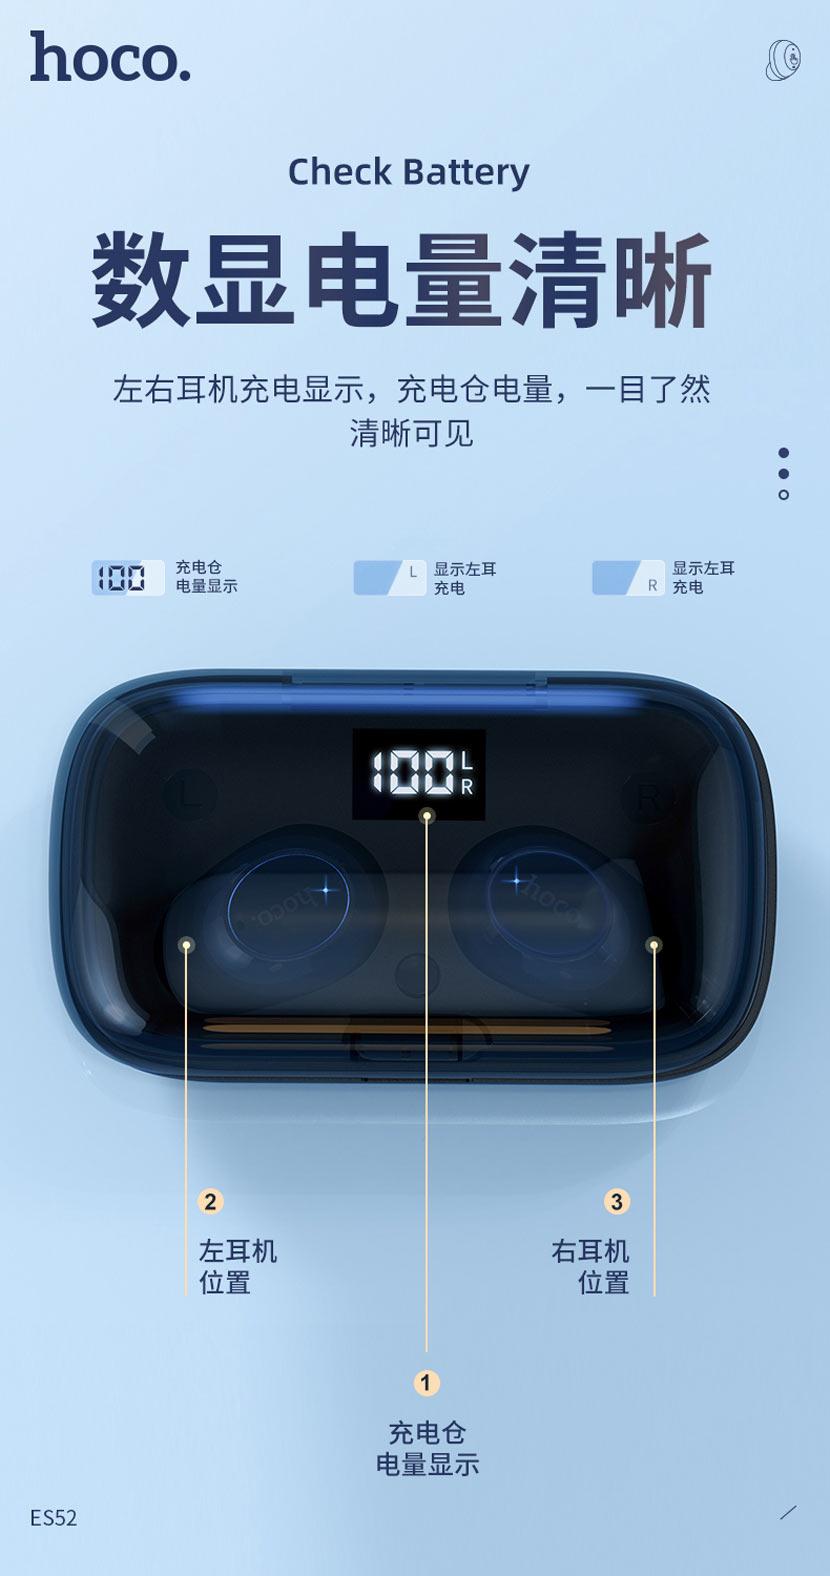 hoco news es52 delight tws wireless bt headset display cn